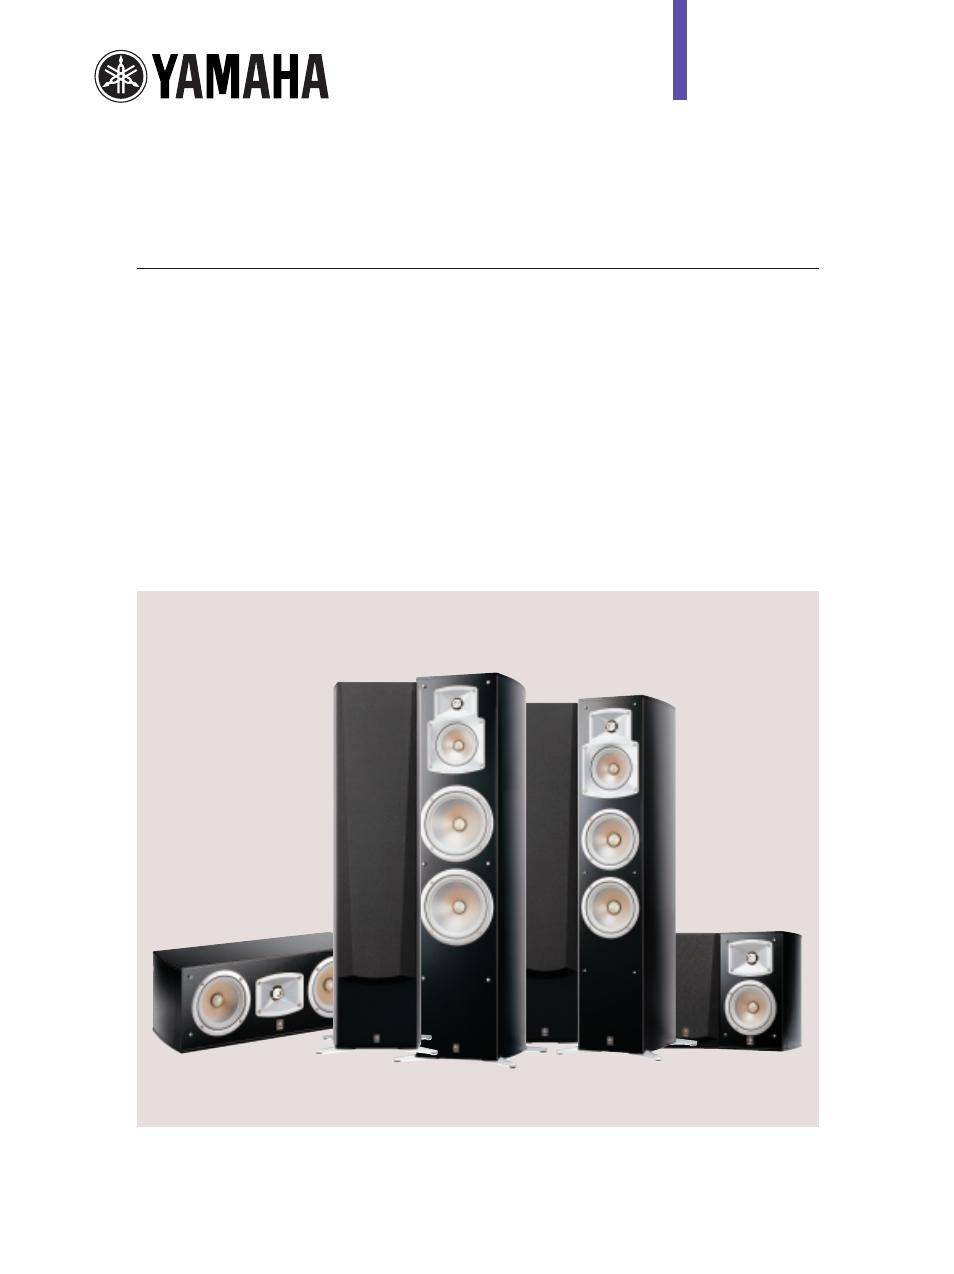 Acoustics Yamaha NS 777: characteristics, photos and reviews 89